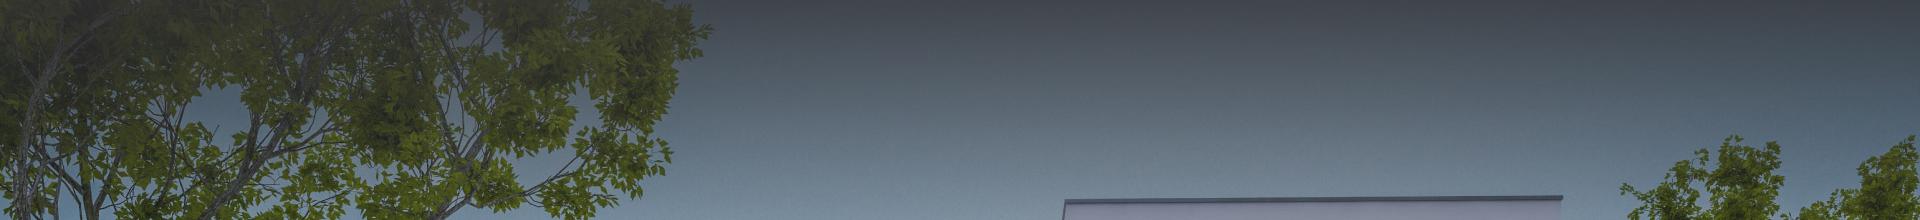 Brise soleil 65, Brise soleil Côte Basque, Brise soleil Pau, Clôture 65, Clôture Côte Basque, Clôture Pau, Escaliers 65, Escaliers Côte Basque, Escaliers Pau, Fenêtres 65, Fenêtres Côte Basque, Fenêtres Pau, Garde corps 65, Garde corps Côte Basque, Garde corps Pau, Menuiserie 65, Menuiserie Côte Basque, Menuiserie Pau, Métallerie 65, Métallerie Côte Basque, Métallerie Pau, Pergolas 65, Pergolas Côte Basque, Pergolas Pau, Portails 65, Portails Côte Basque, Portails Pau, Portes 65, Portes Côte Basque, Portes de garage 65, Portes de garage Côte Basque, Portes de garage Pau, Portes Pau, Serrurerie 65, Serrurerie Côte Basque, Serrurerie Pau, Verrière 65, Verrière Côte Basque, Verrière Pau